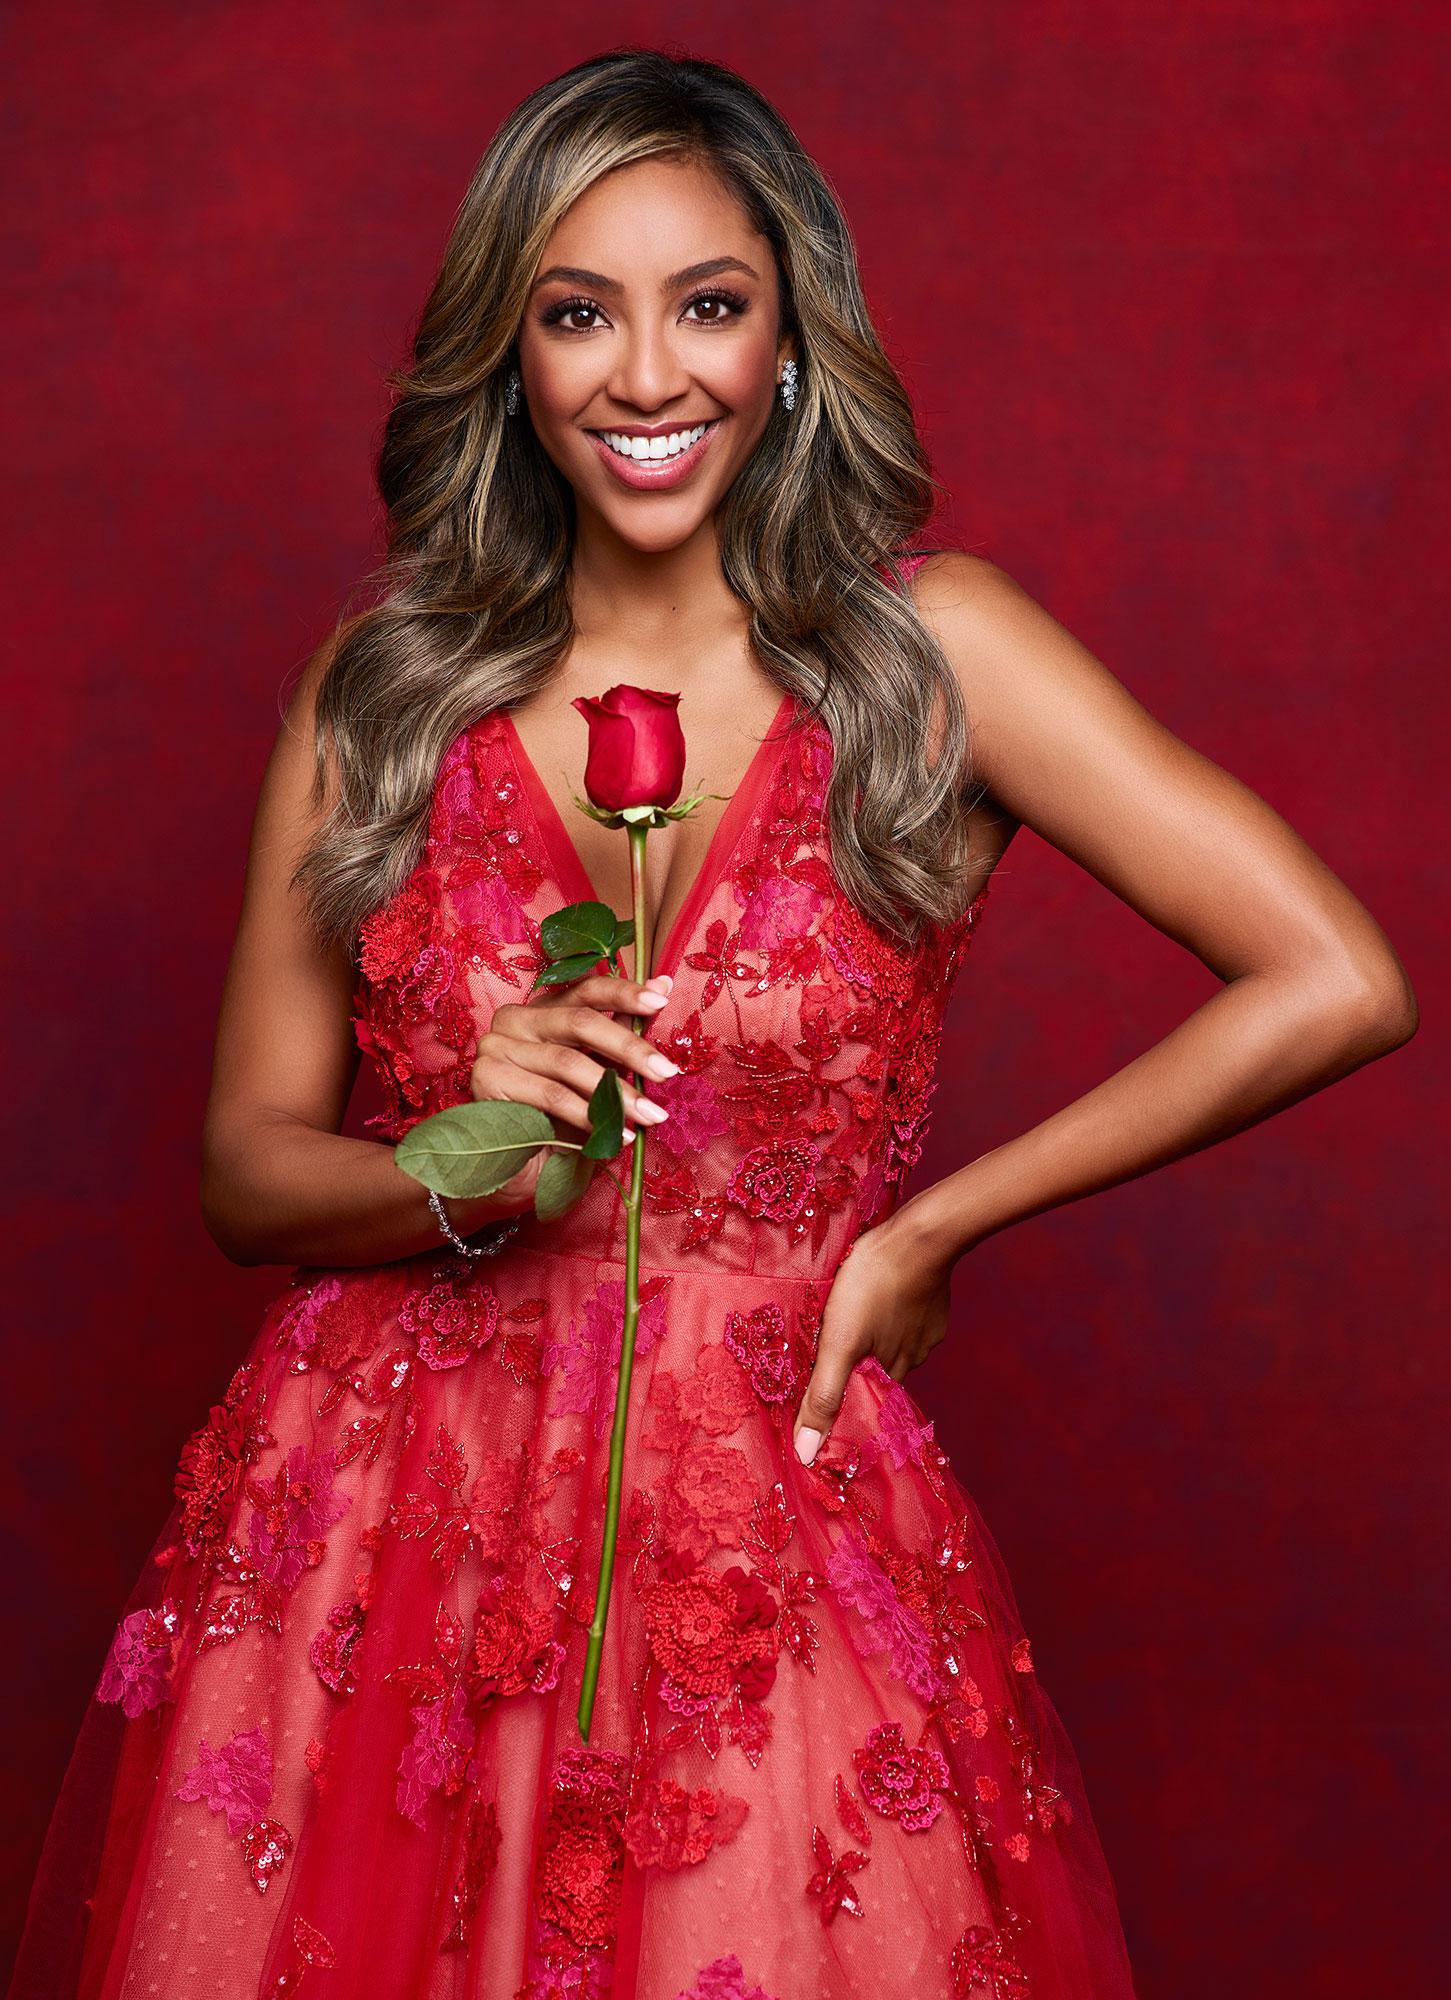 'Bachelorette' Season 16 Scorecard: Tayshia Adams' Rose Tracker